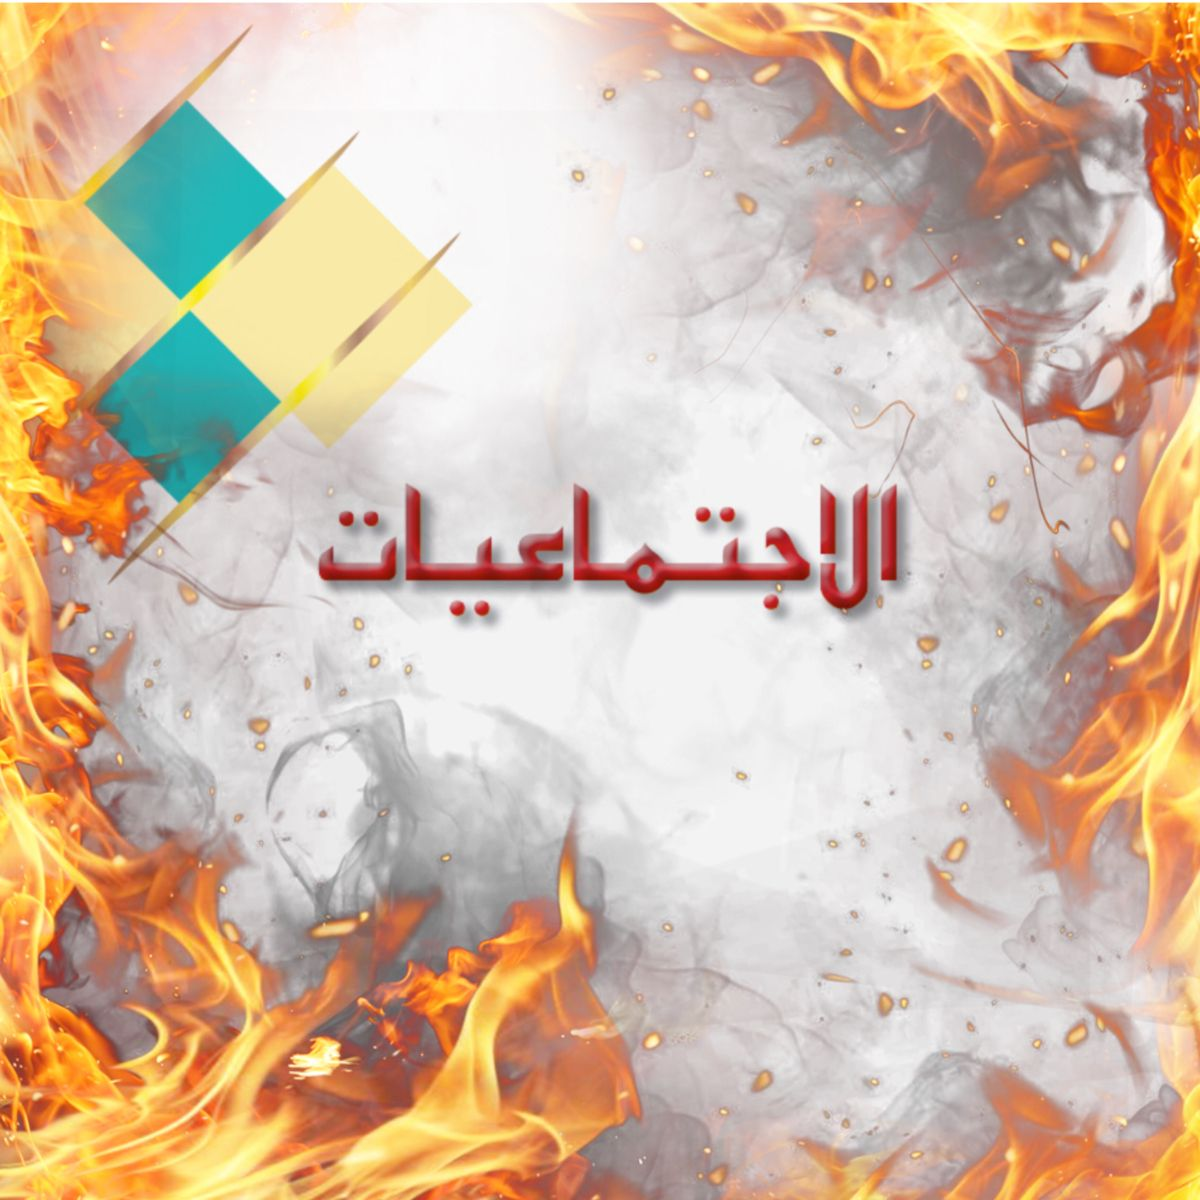 اطالب بحرق كل كتب الاجتماعيات Poster Movie Posters Art